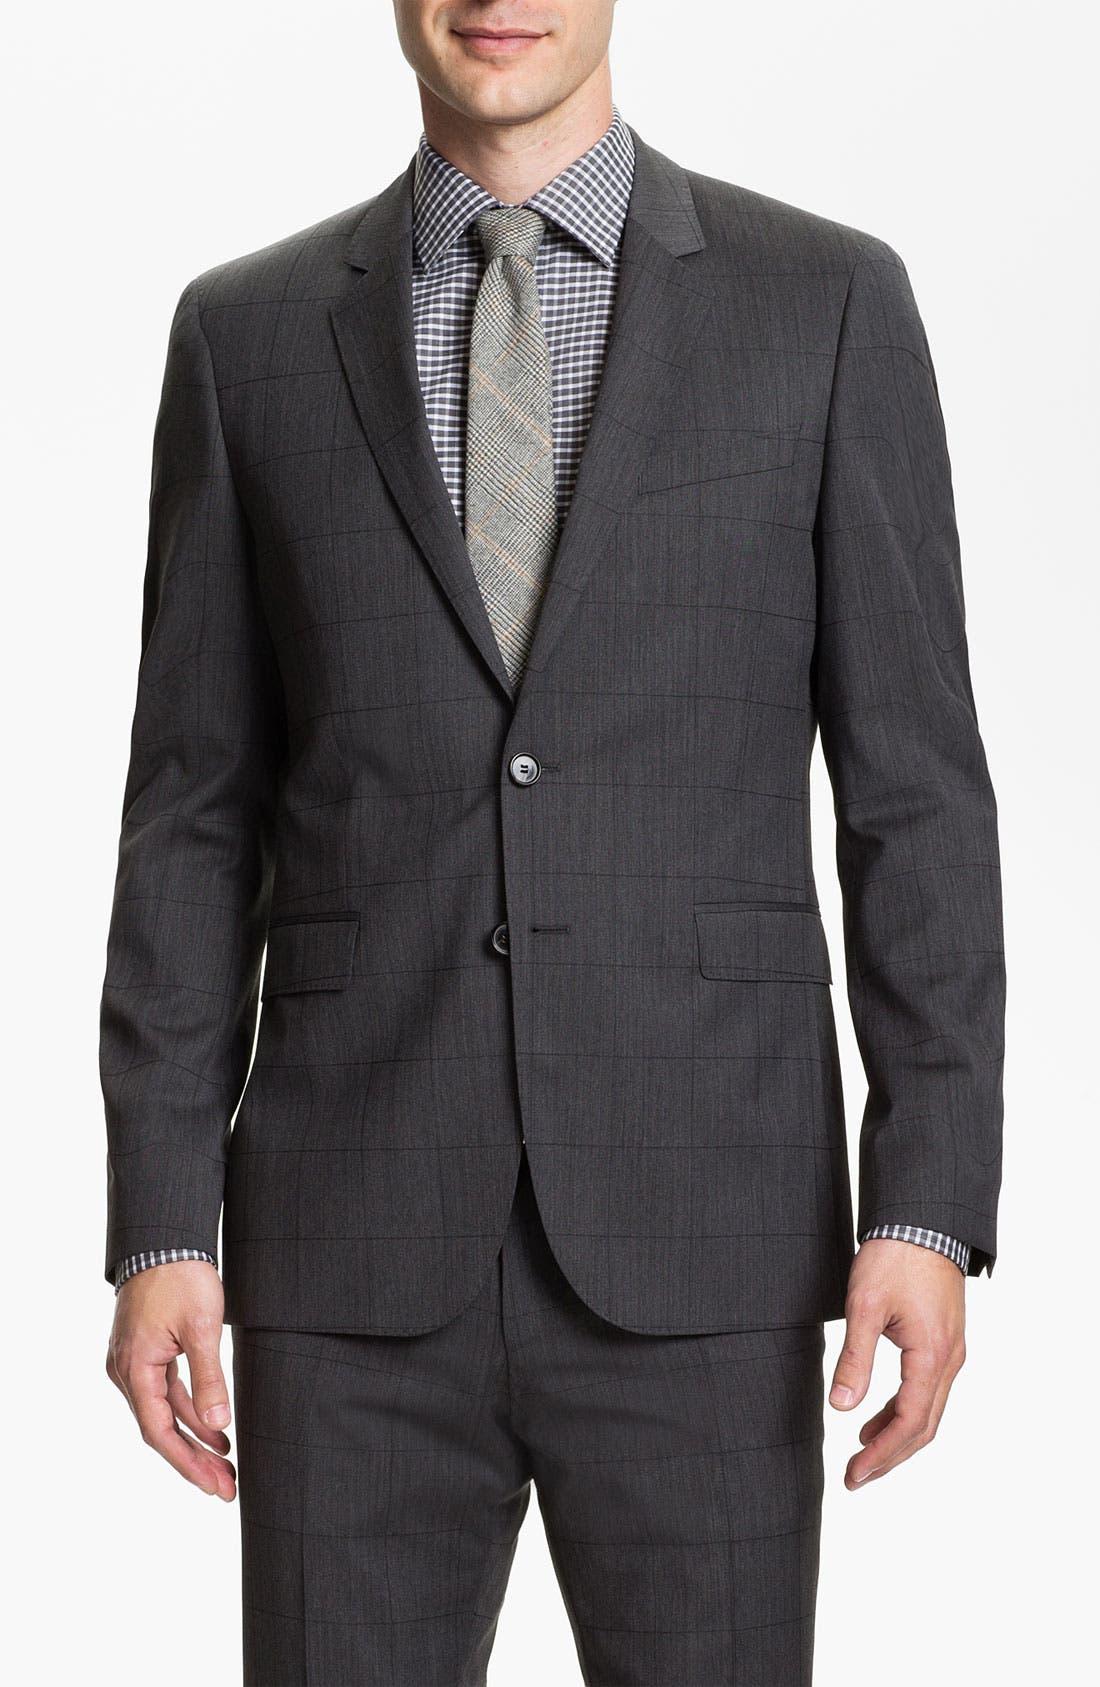 Alternate Image 1 Selected - BOSS HUGO BOSS 'Ryan/Win' Extra Trim Fit Suit